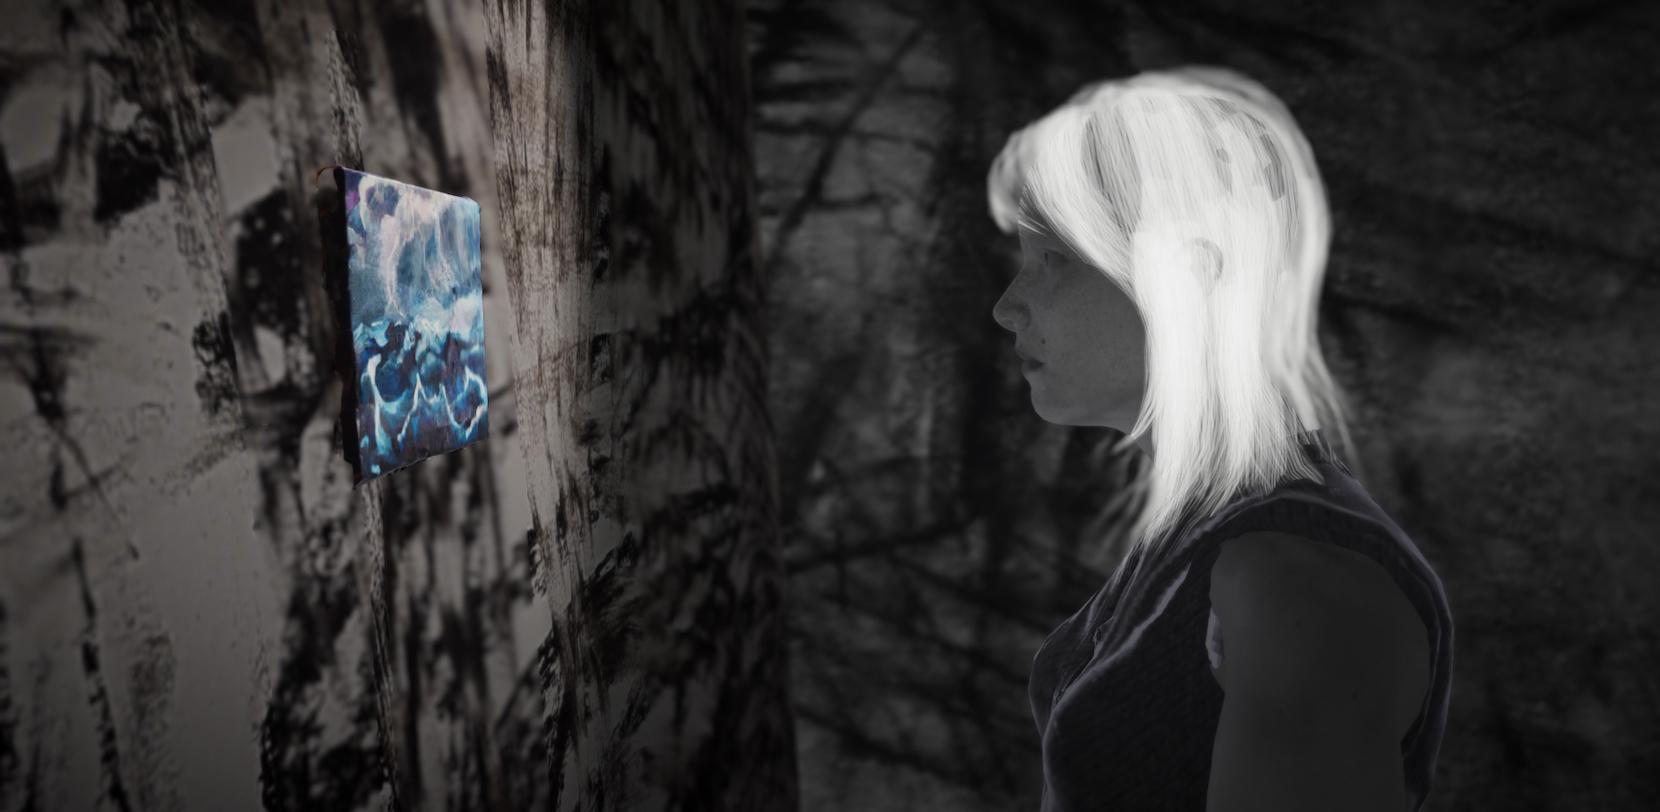 Lauren Moffatt, Technology Echoes Install, Digital Sketch